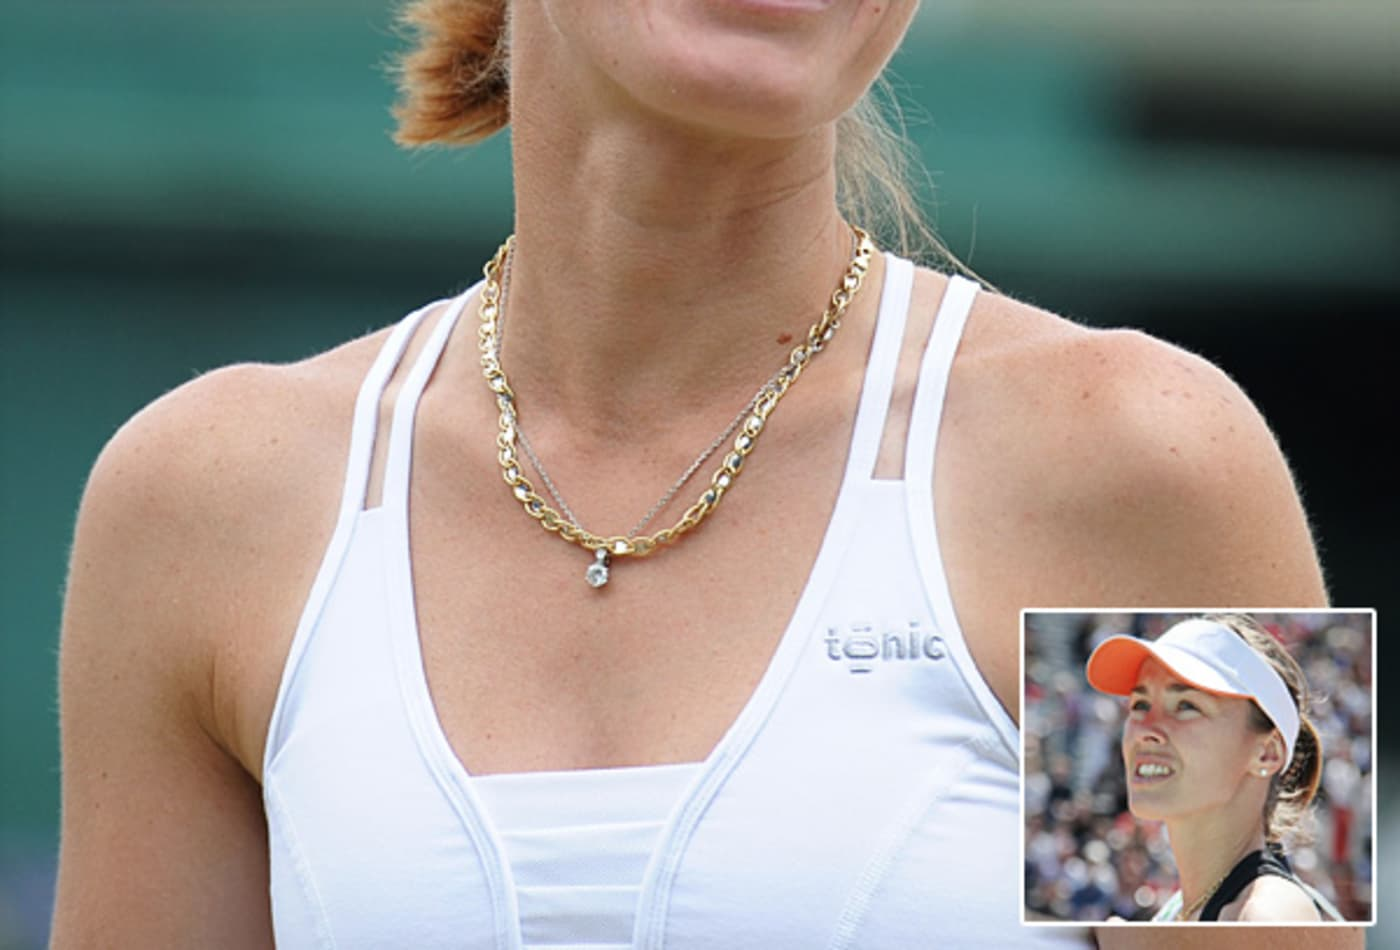 Martina-Hingis-Athlete-Clothing-Lines-CNBC.jpg